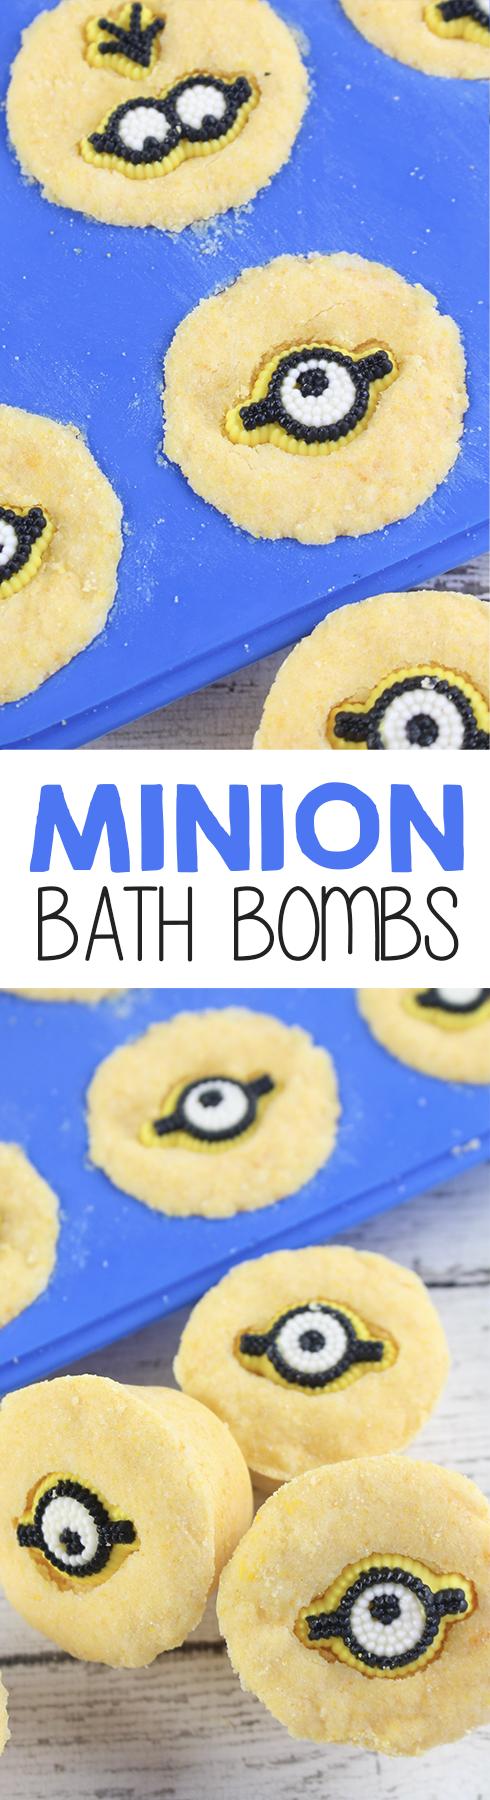 Minion Bath Bombs Recipe